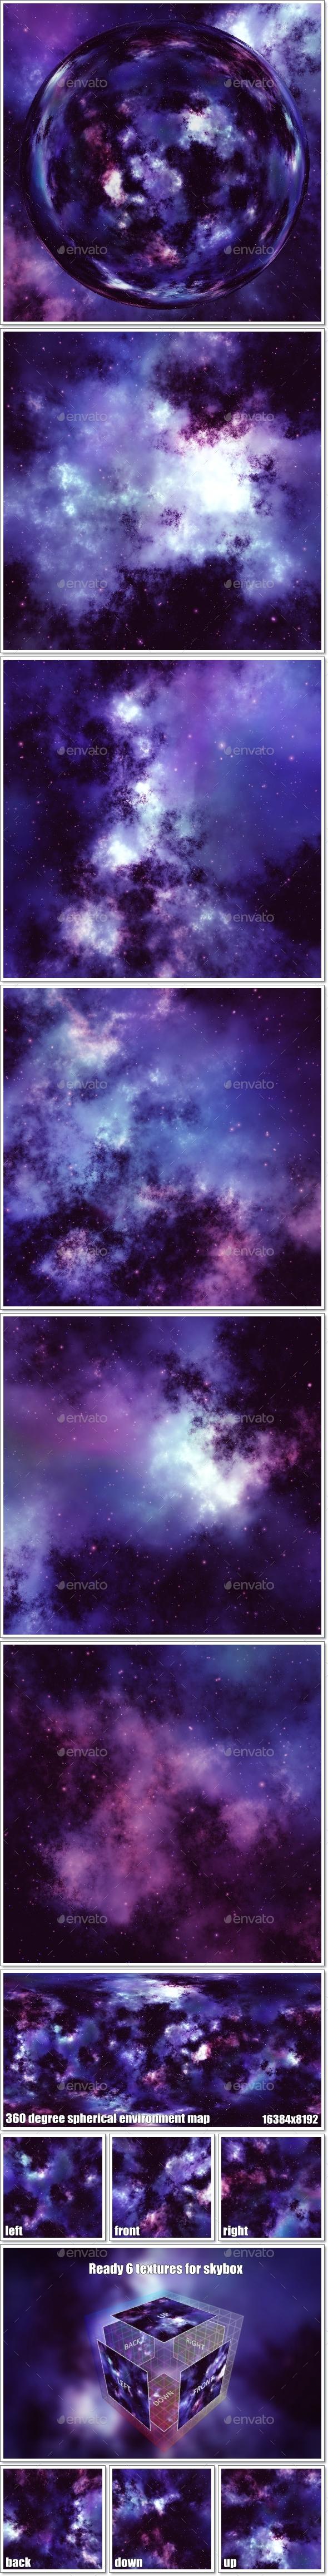 Nebula Space Environment HDRI Map 011 - 3DOcean Item for Sale